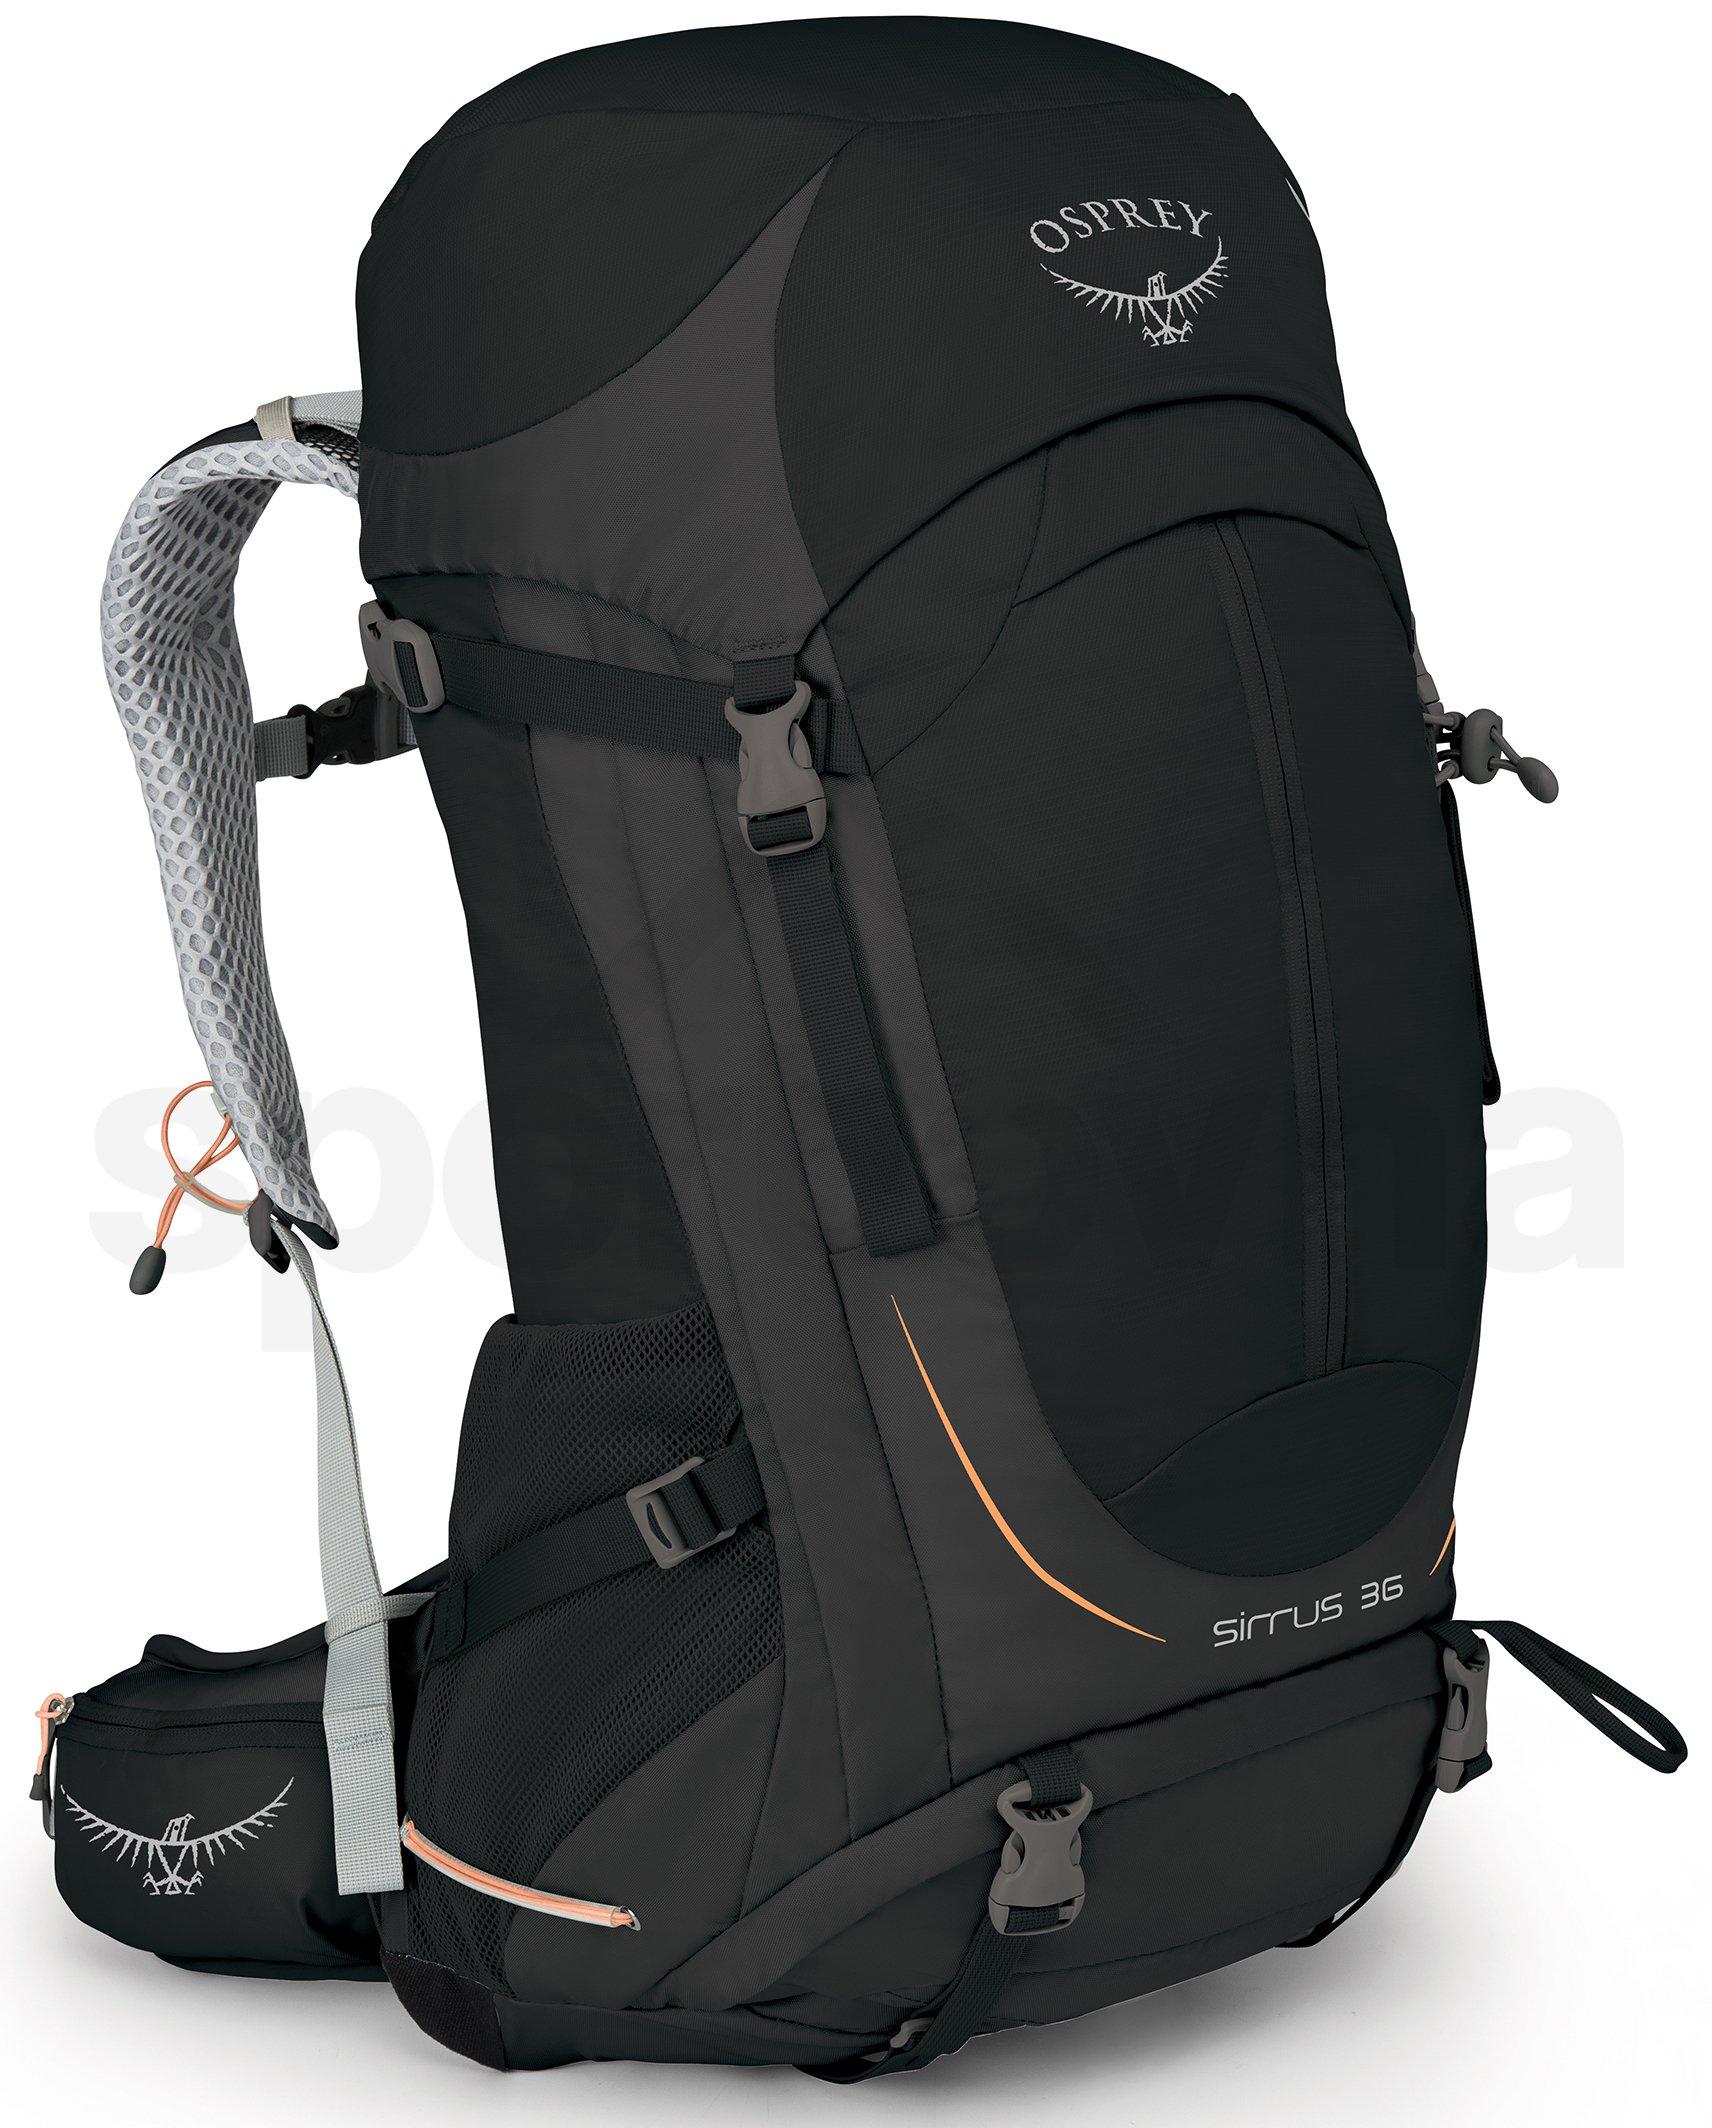 Batoh Osprey Sirrus 36 II WS/WM - černá